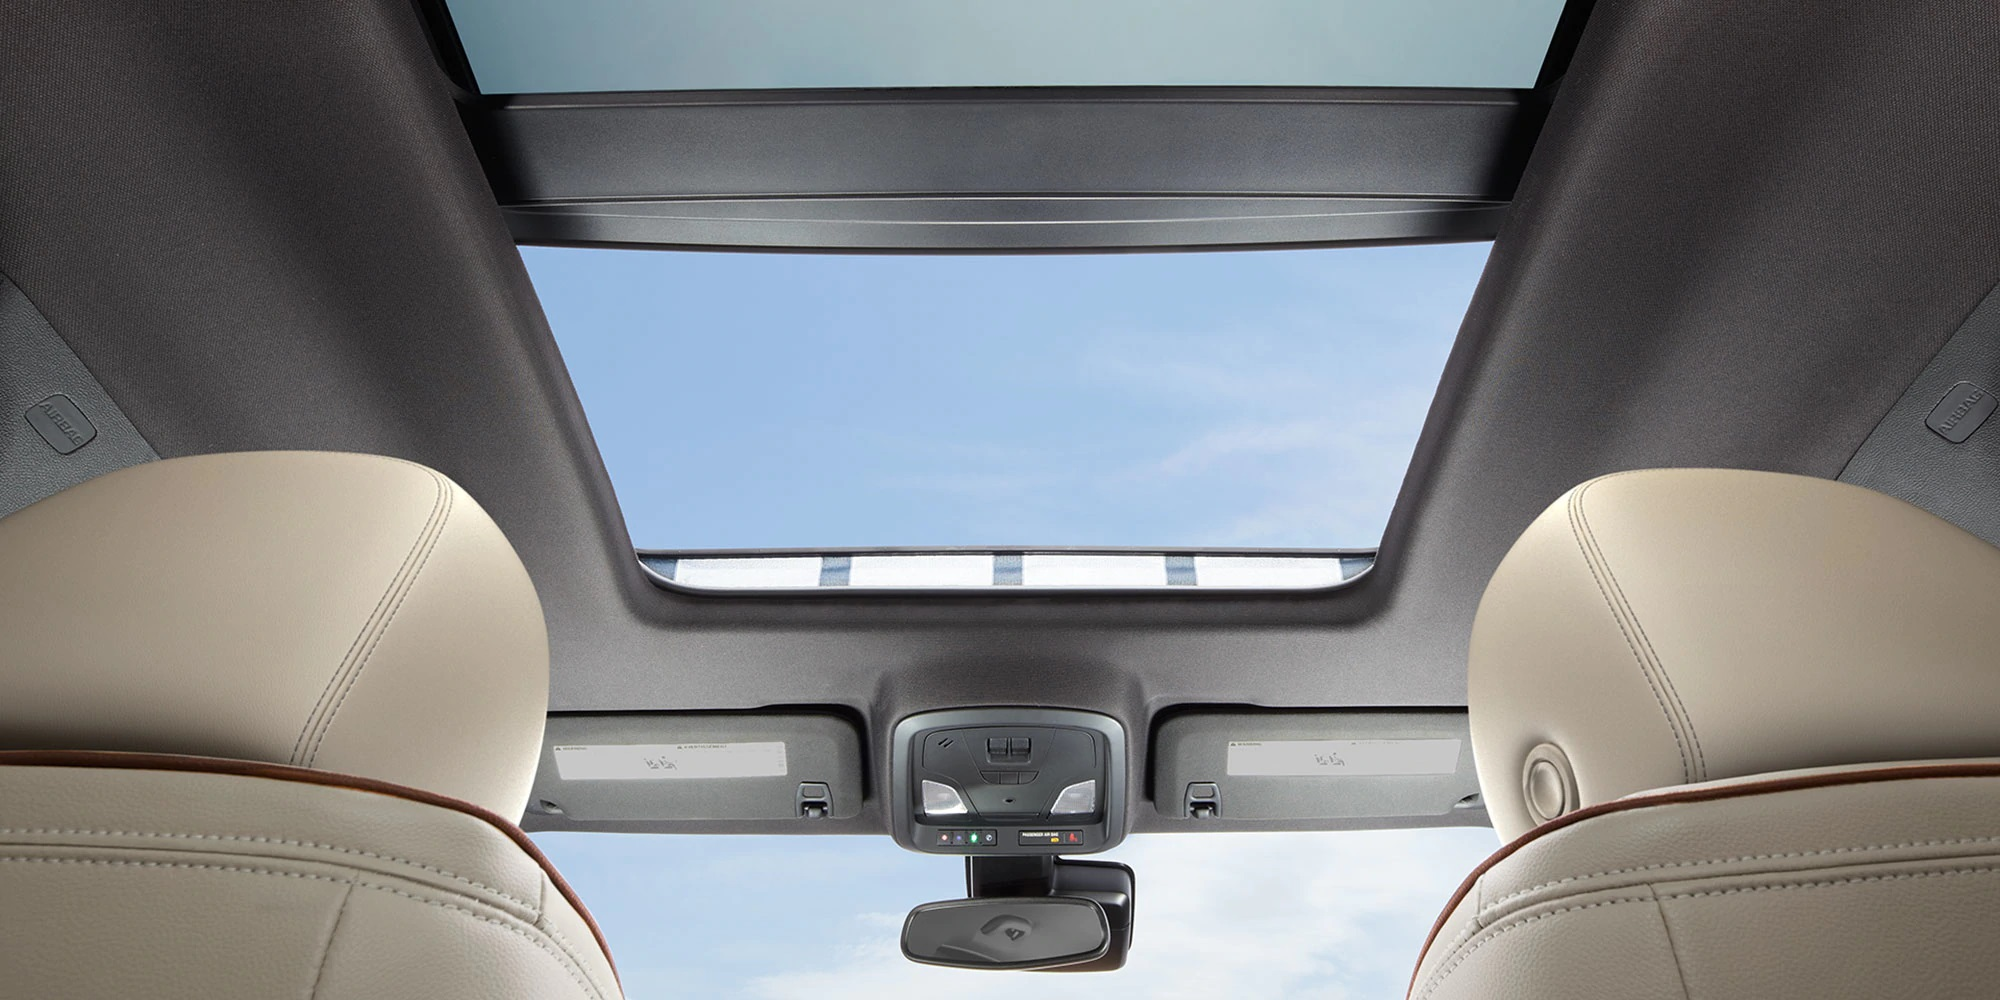 2019 Chevrolet Impala Sunroof